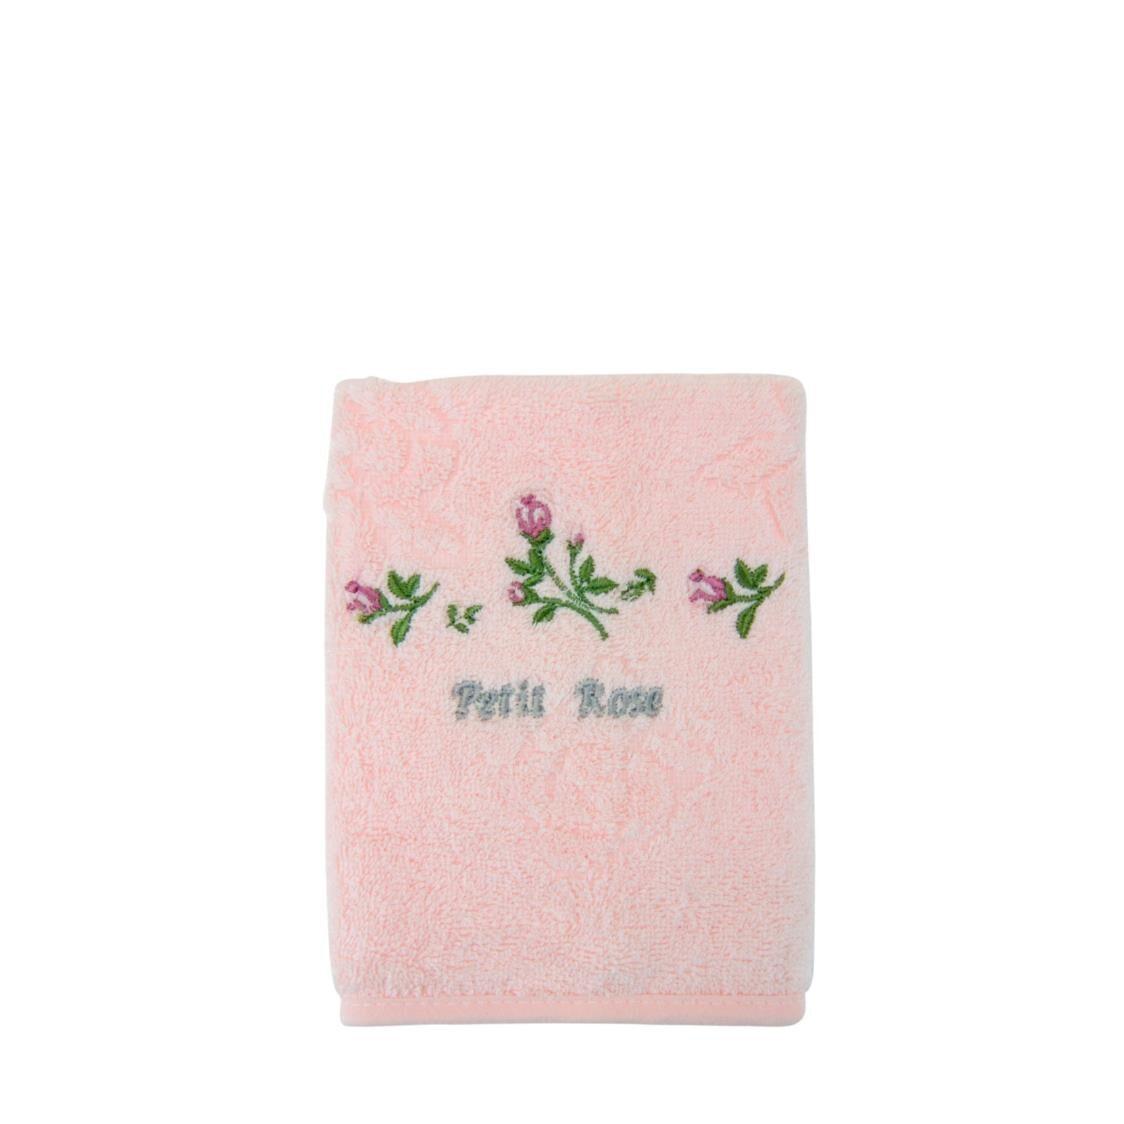 Petit Rose 100 Combed Cotton Face Towel Pink